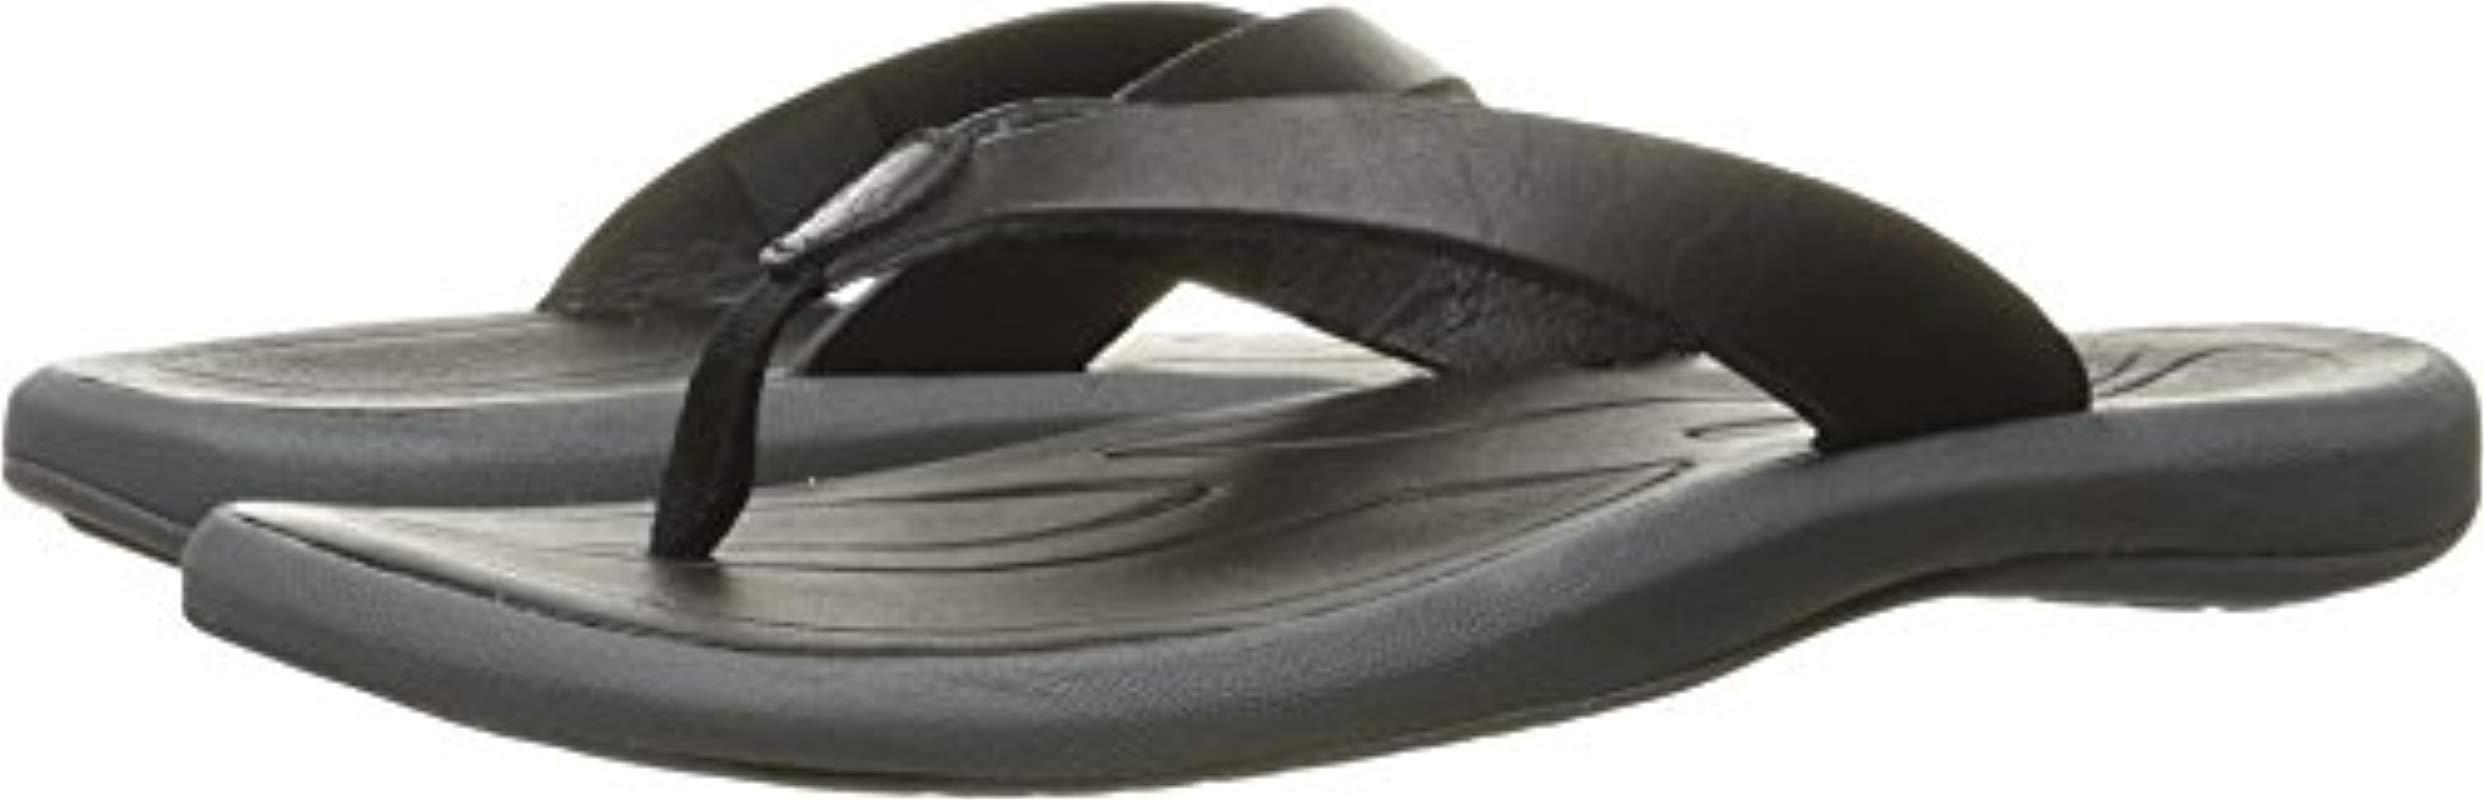 Columbia Caprizee Leather Flip Athletic